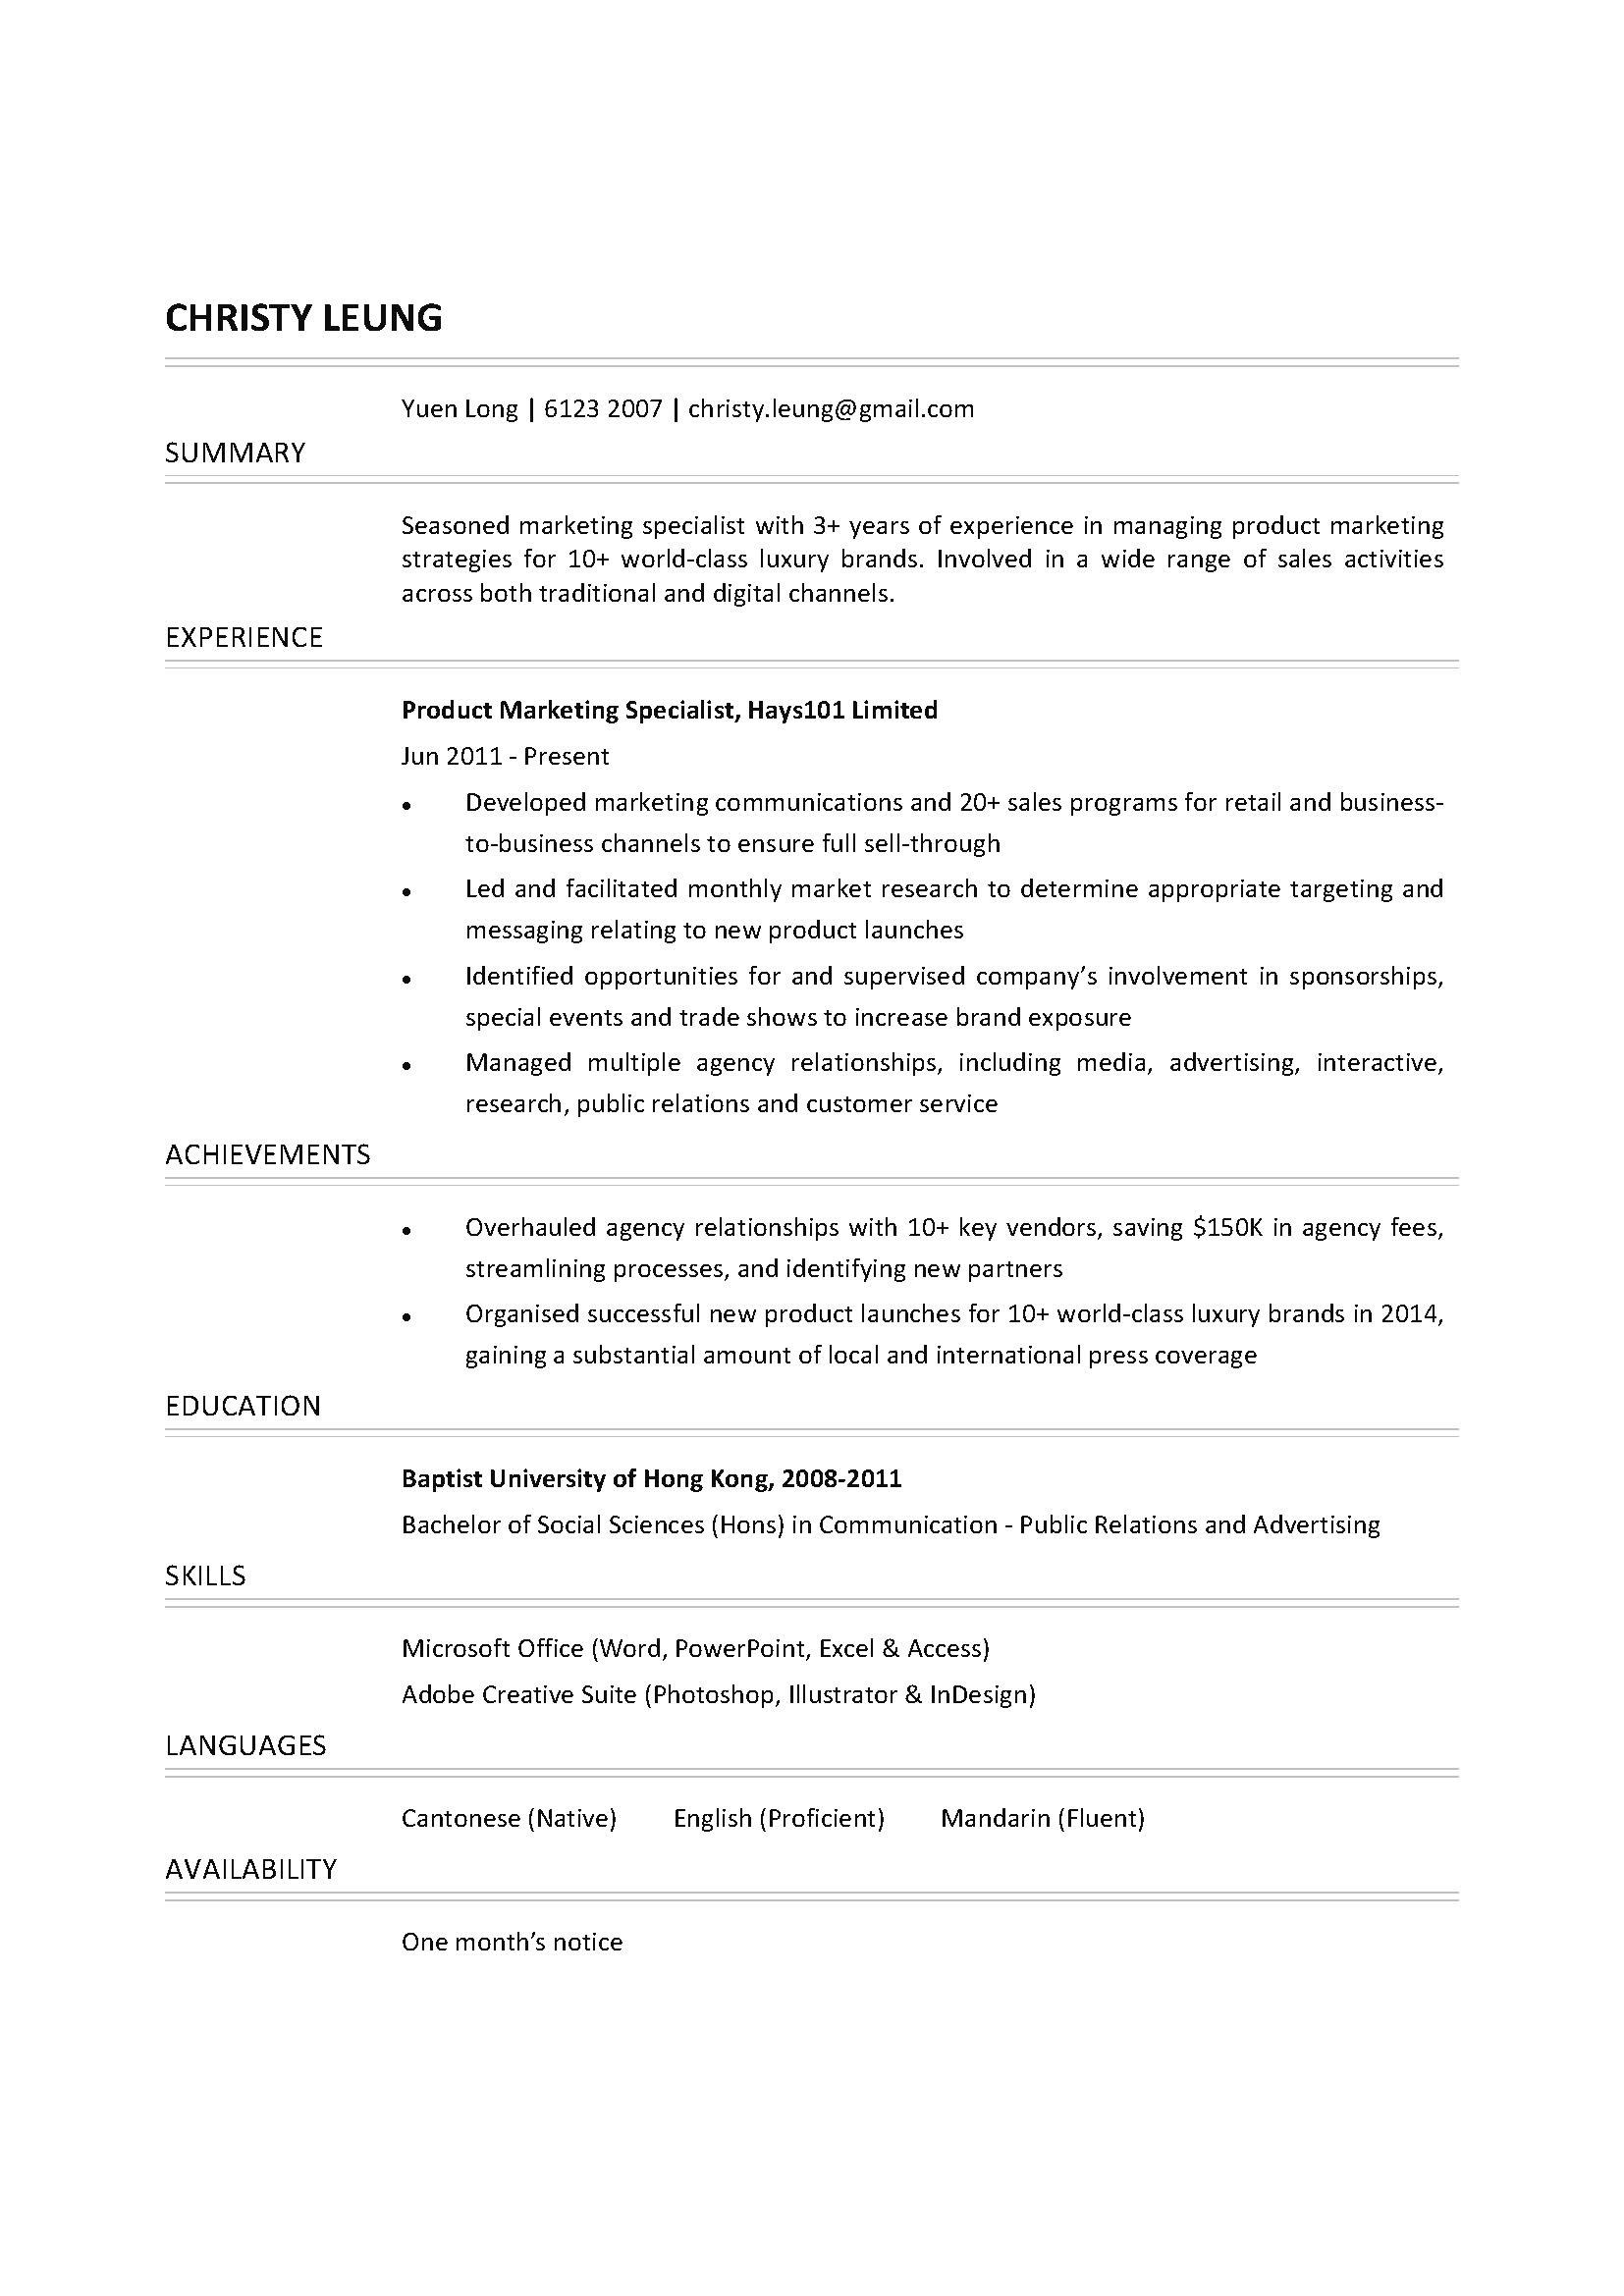 Product Marketing Specialist CV